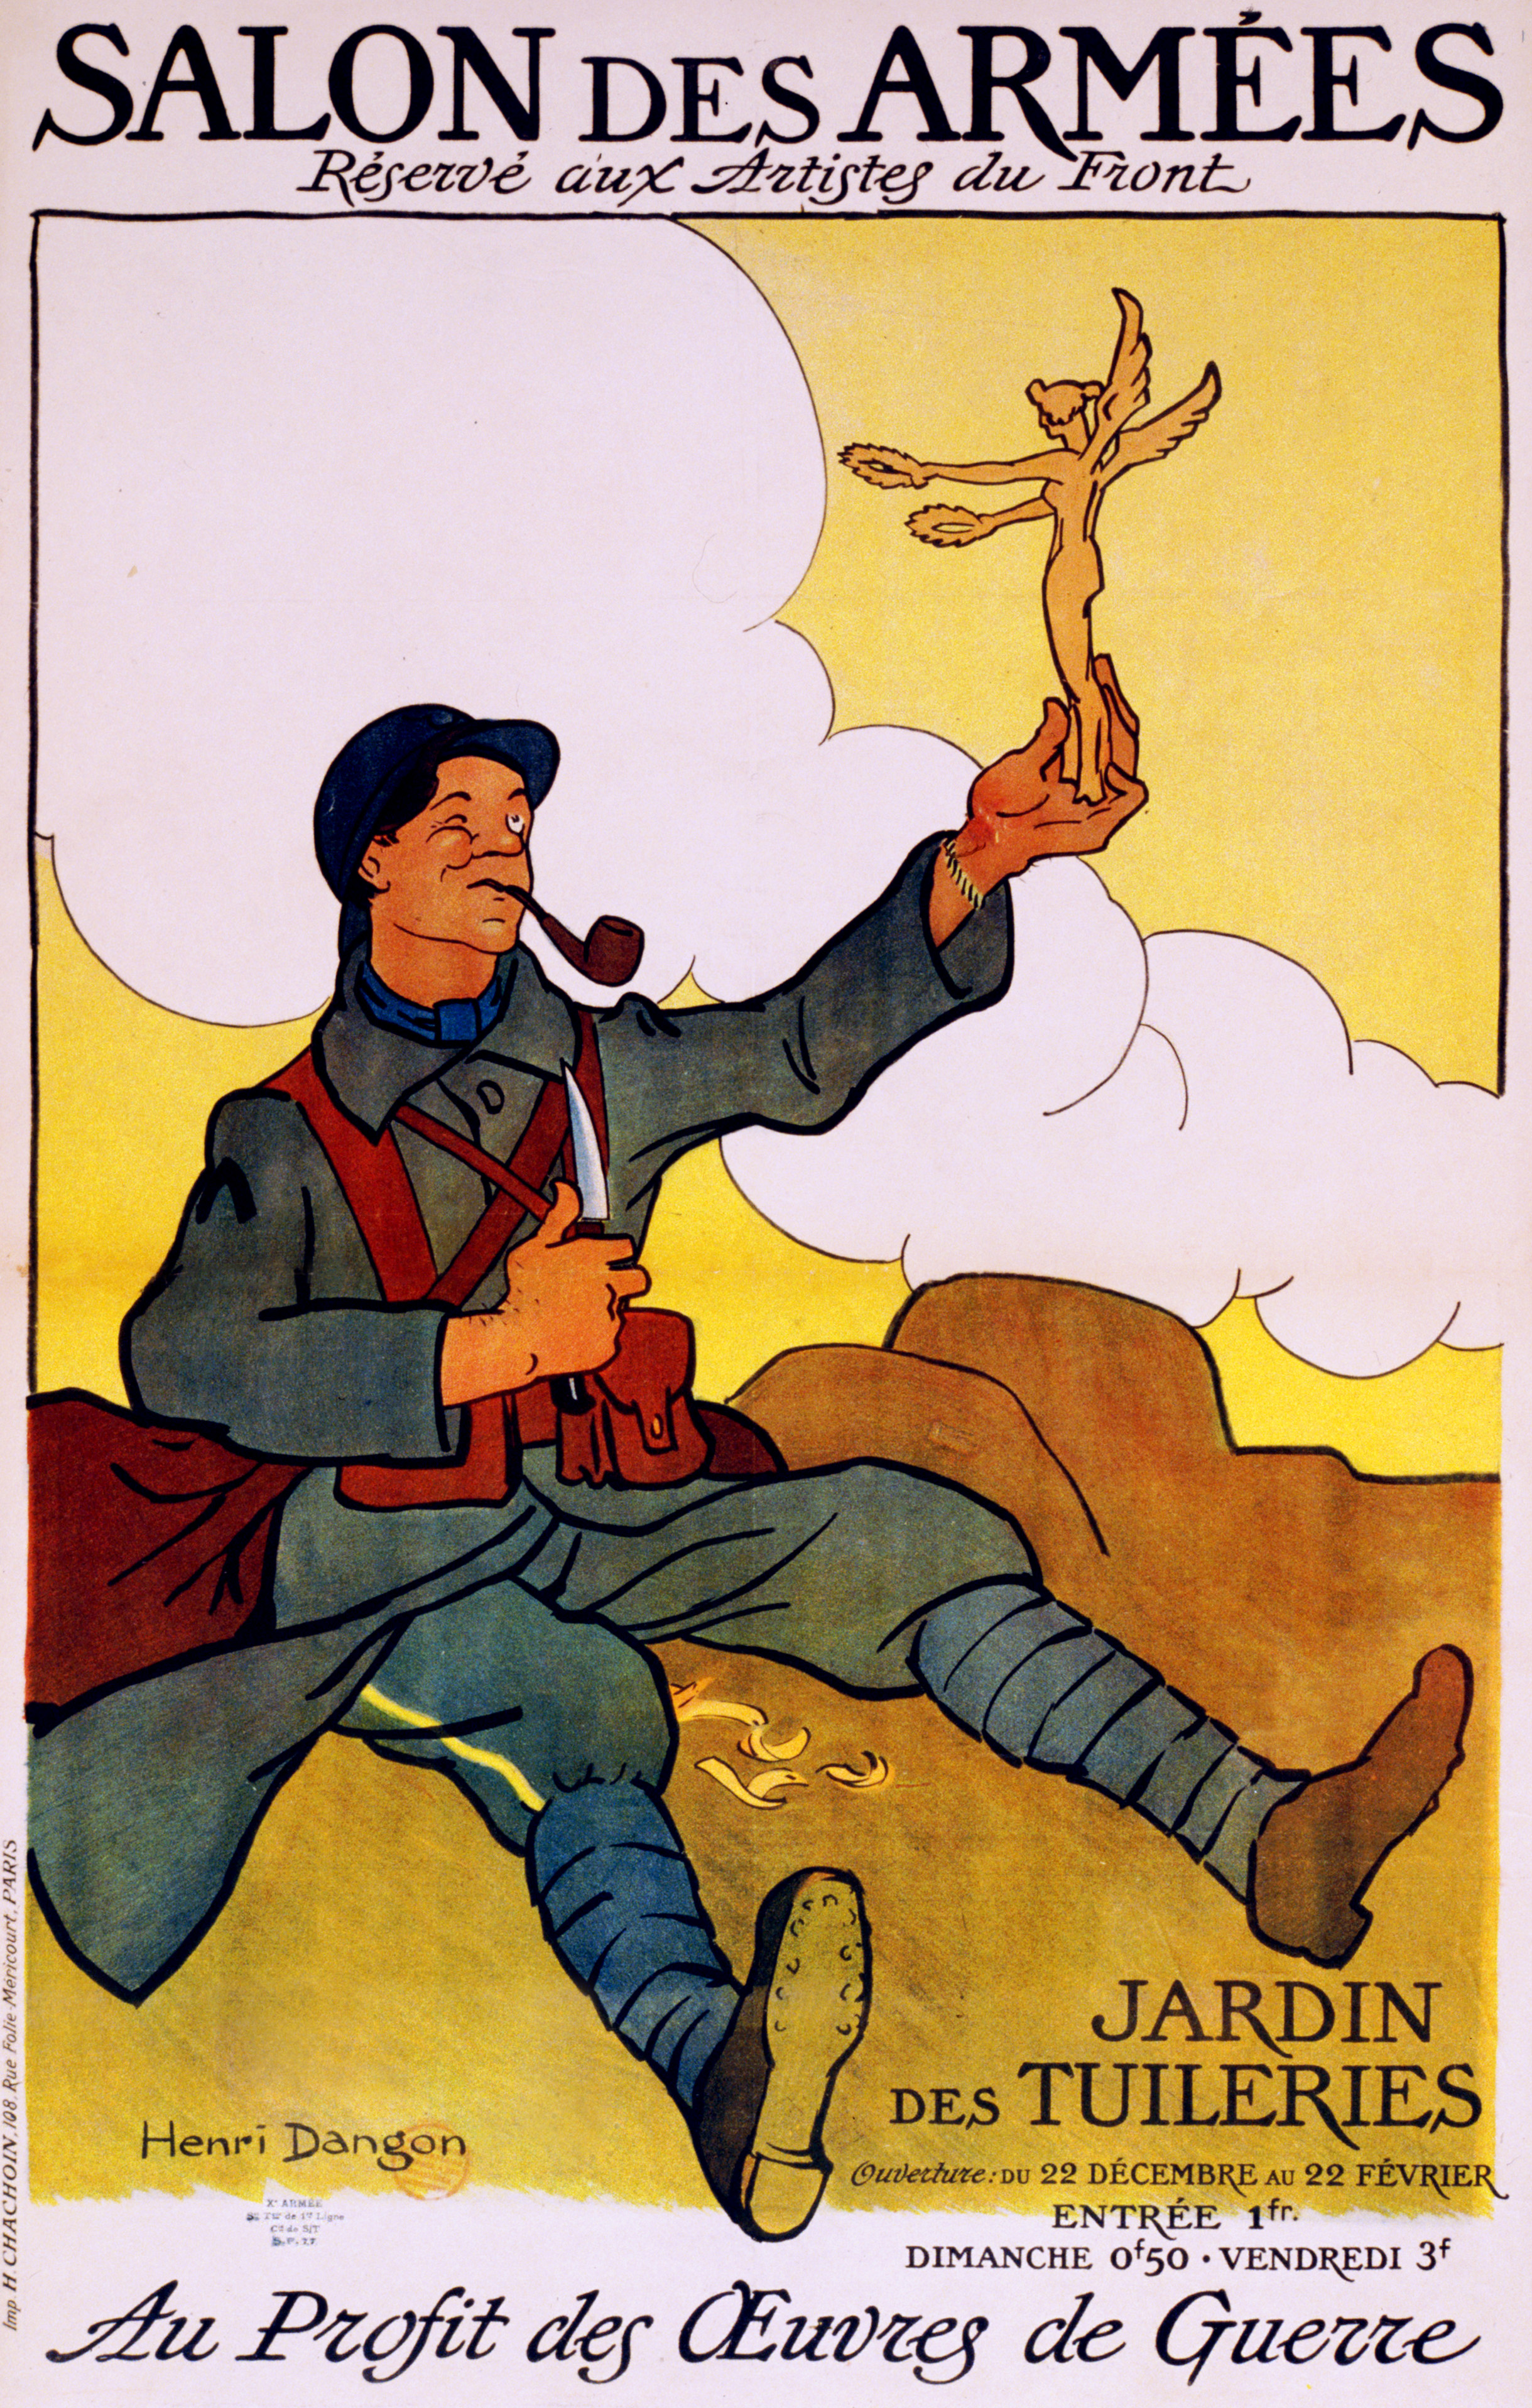 Salon De Jardin Original file:salon des armées, exhibition poster, 1916 - wikipedia